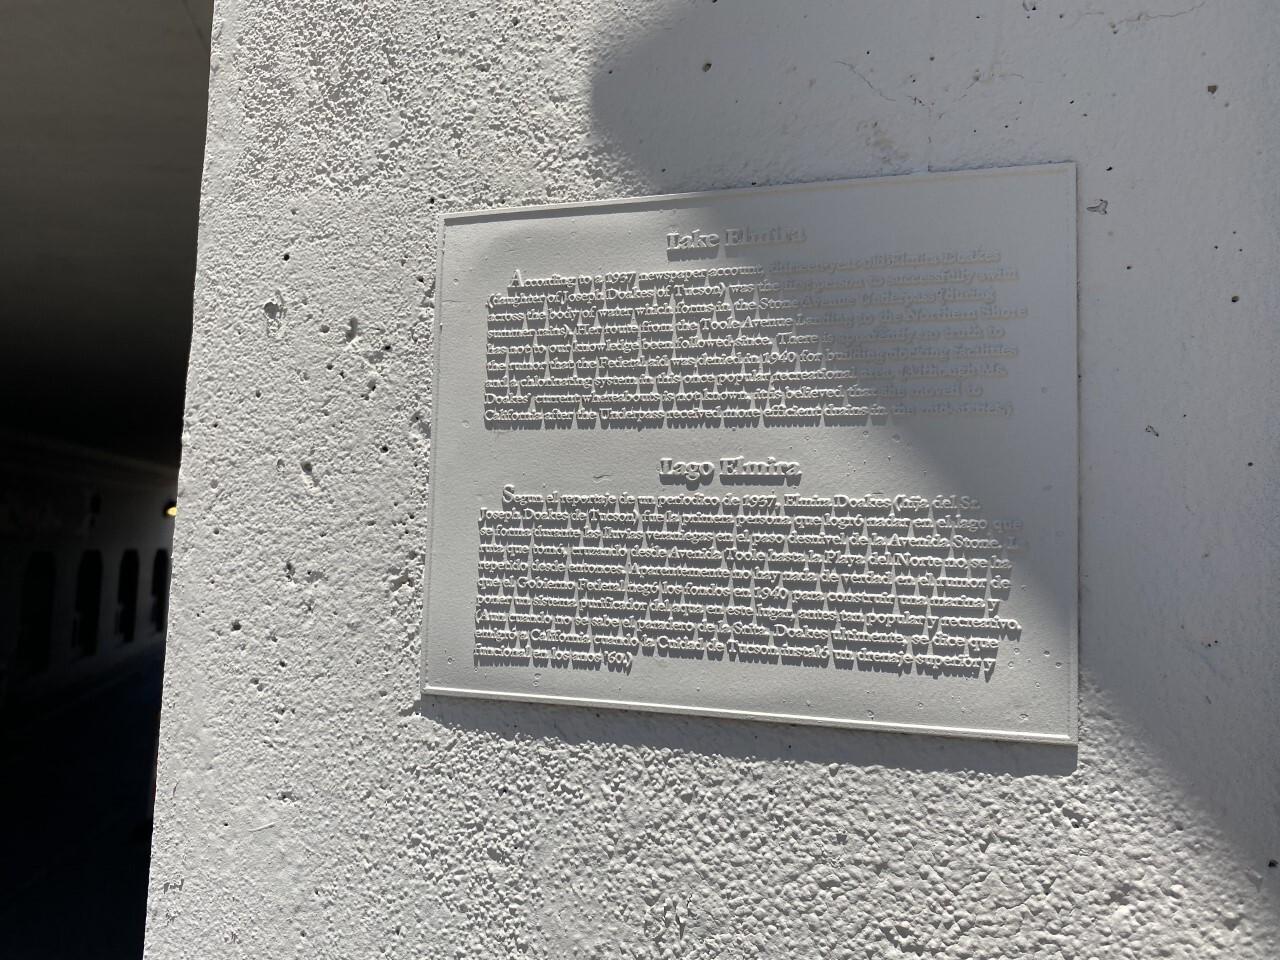 Lake Elmira plaque at Stone Avenue Under